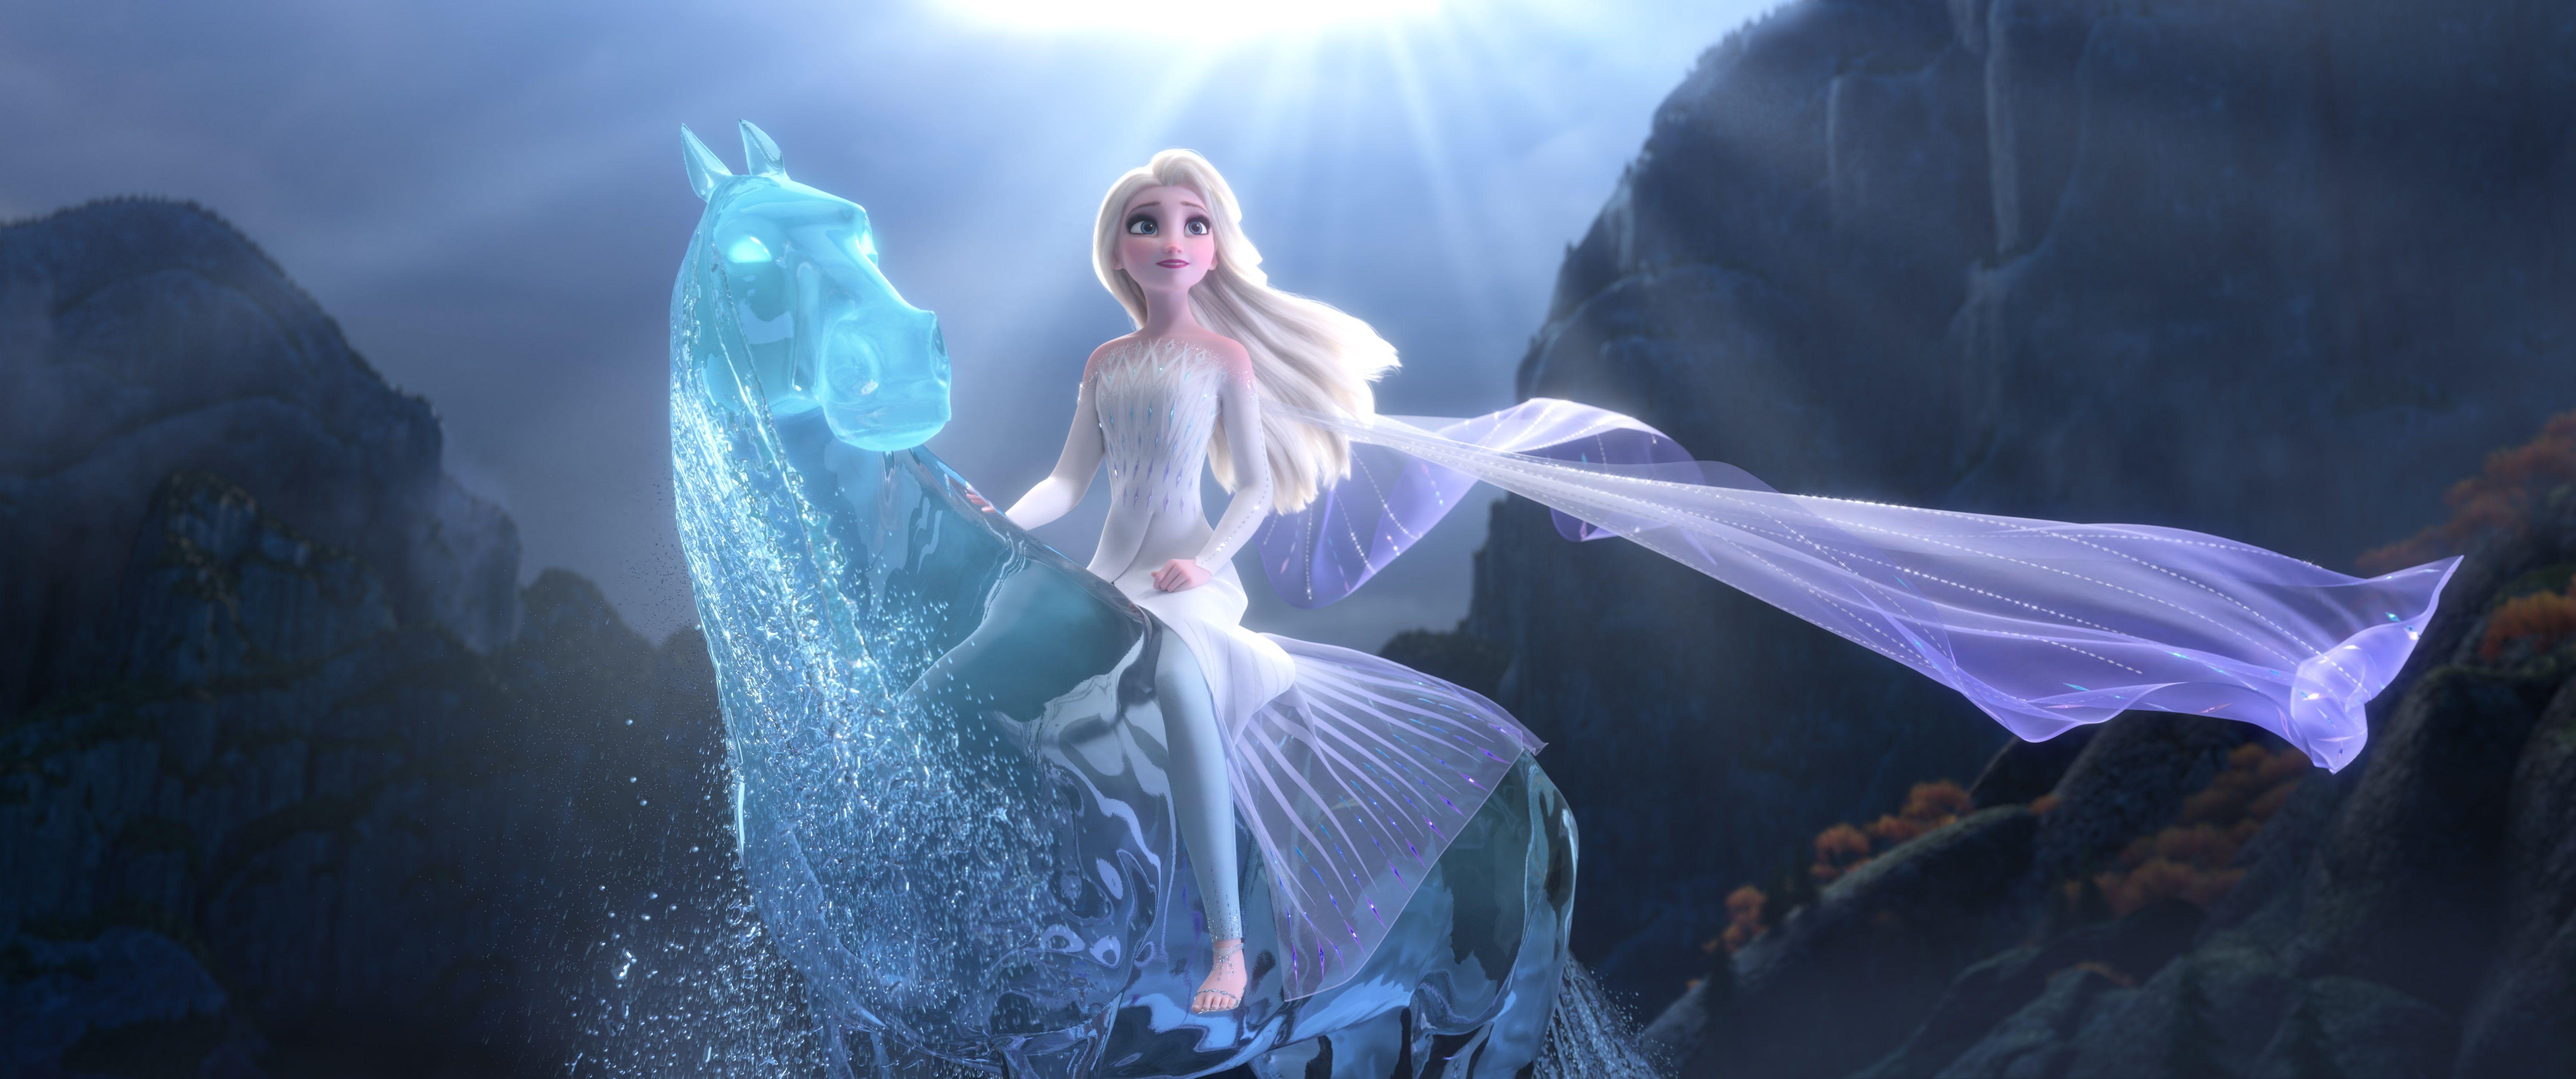 Frozen 2 How Production Design Transformed Elsa Into The Snow Queen Indiewire Disney Princess Elsa Disney Princess Tattoo Snow Queen